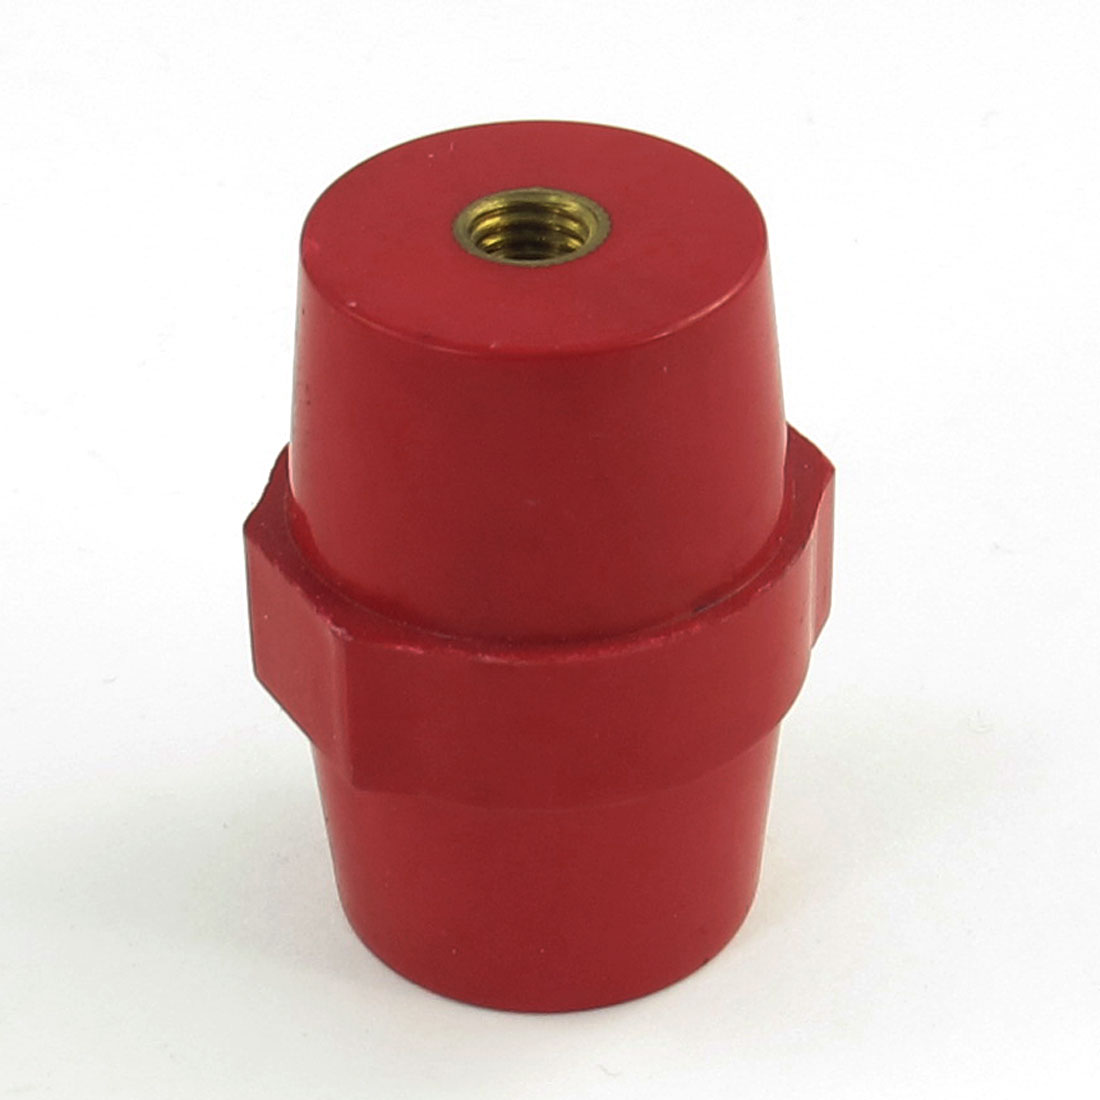 "0.27"" Brass Thread 2"" Height Busbar Enhanced Insulator Supporter Red"